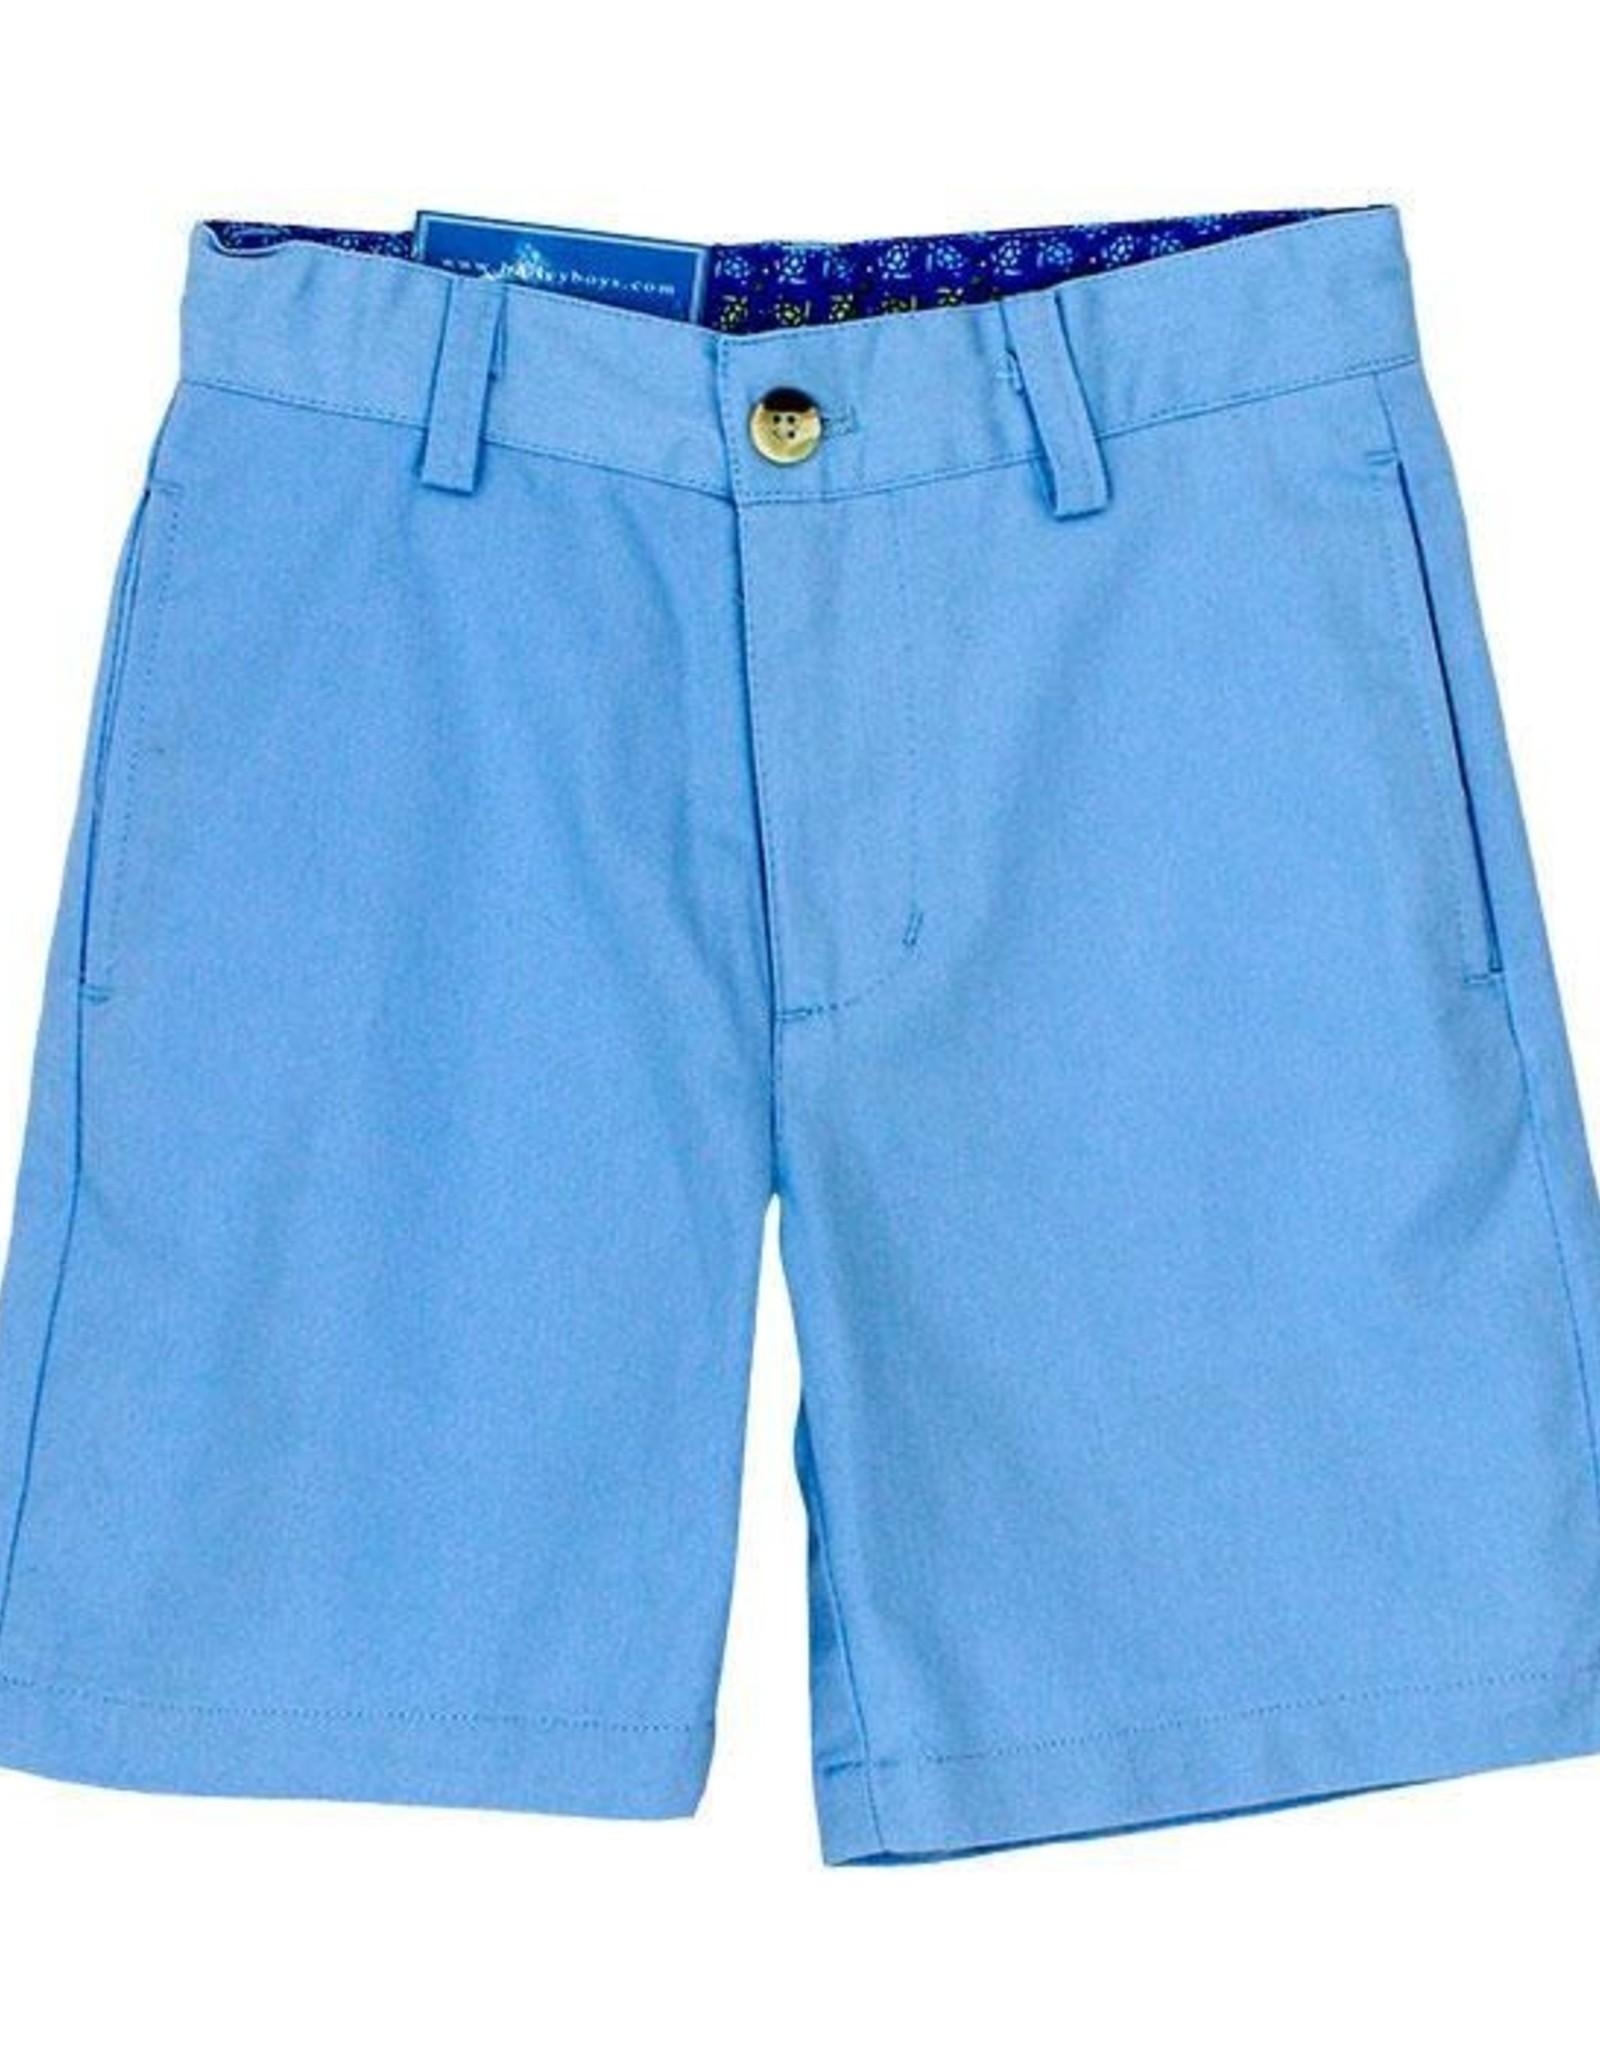 The Bailey Boys Harbor Blue Twill Shorts